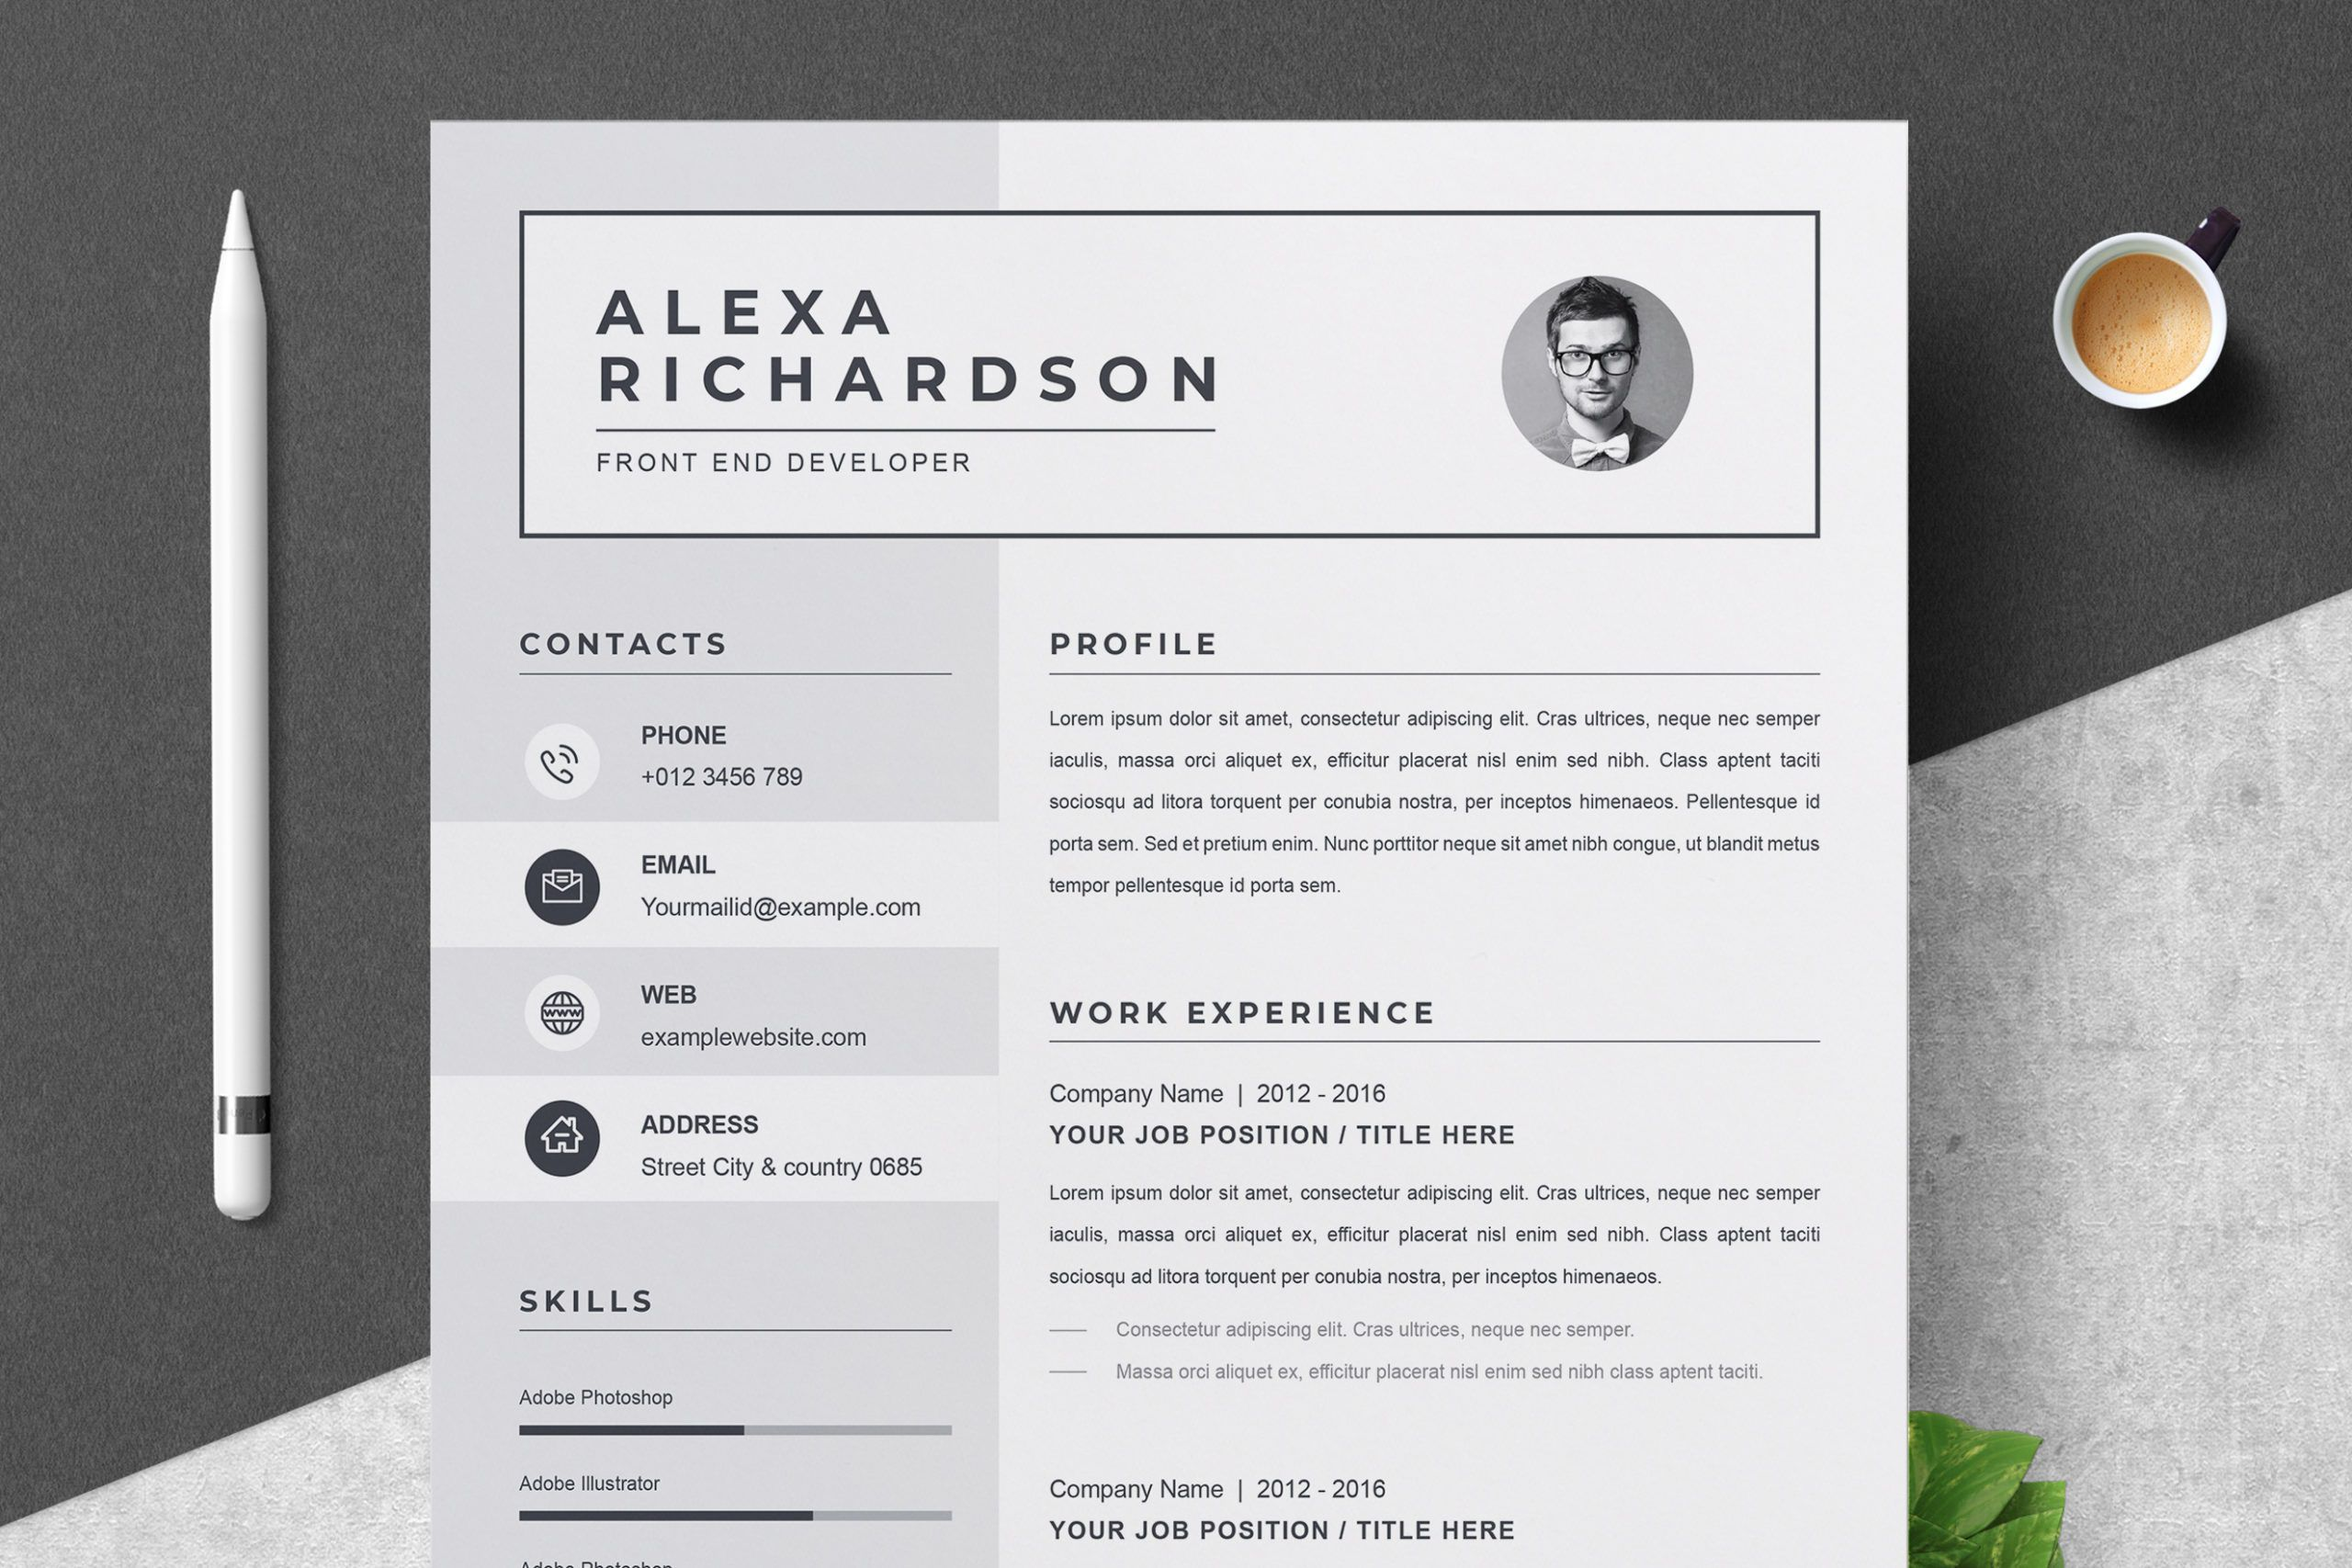 000 Sensational Microsoft Word Design Template Image  Templates Brochure Free MFull